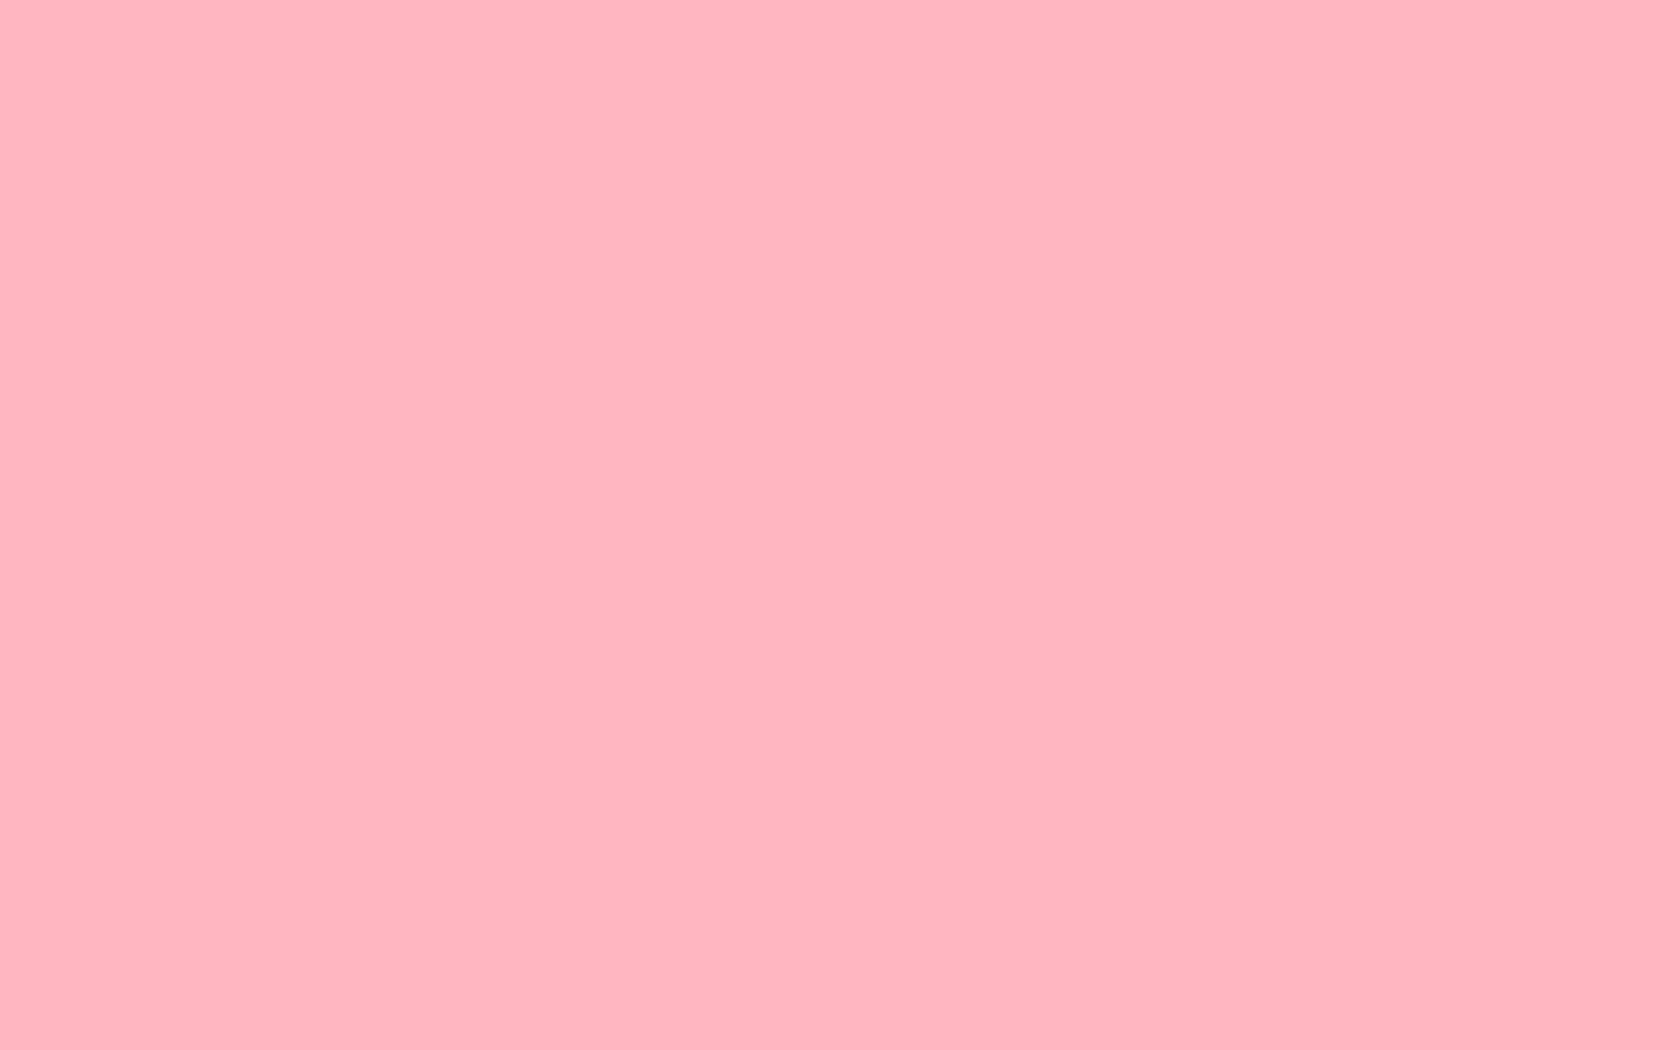 1680x1050 Light Pink Solid Color Background